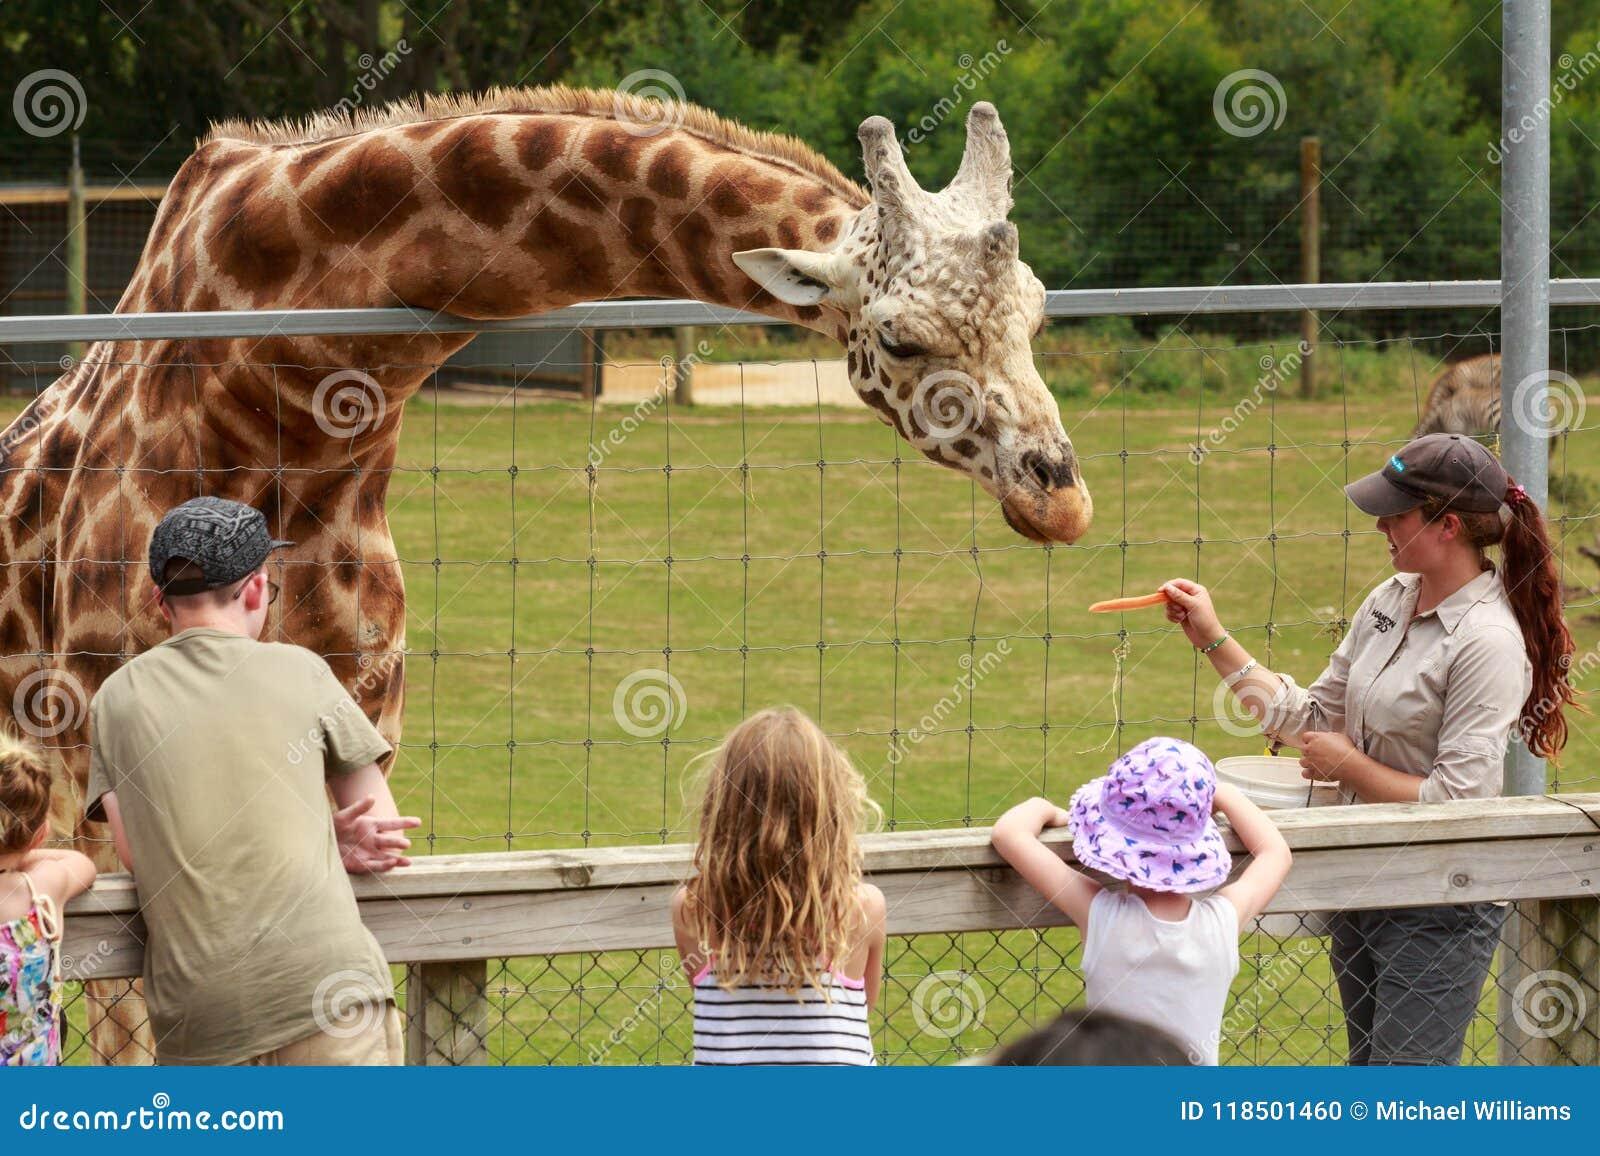 A Zookeeper Hand-feeding A Giraffe Editorial Image - Image ...